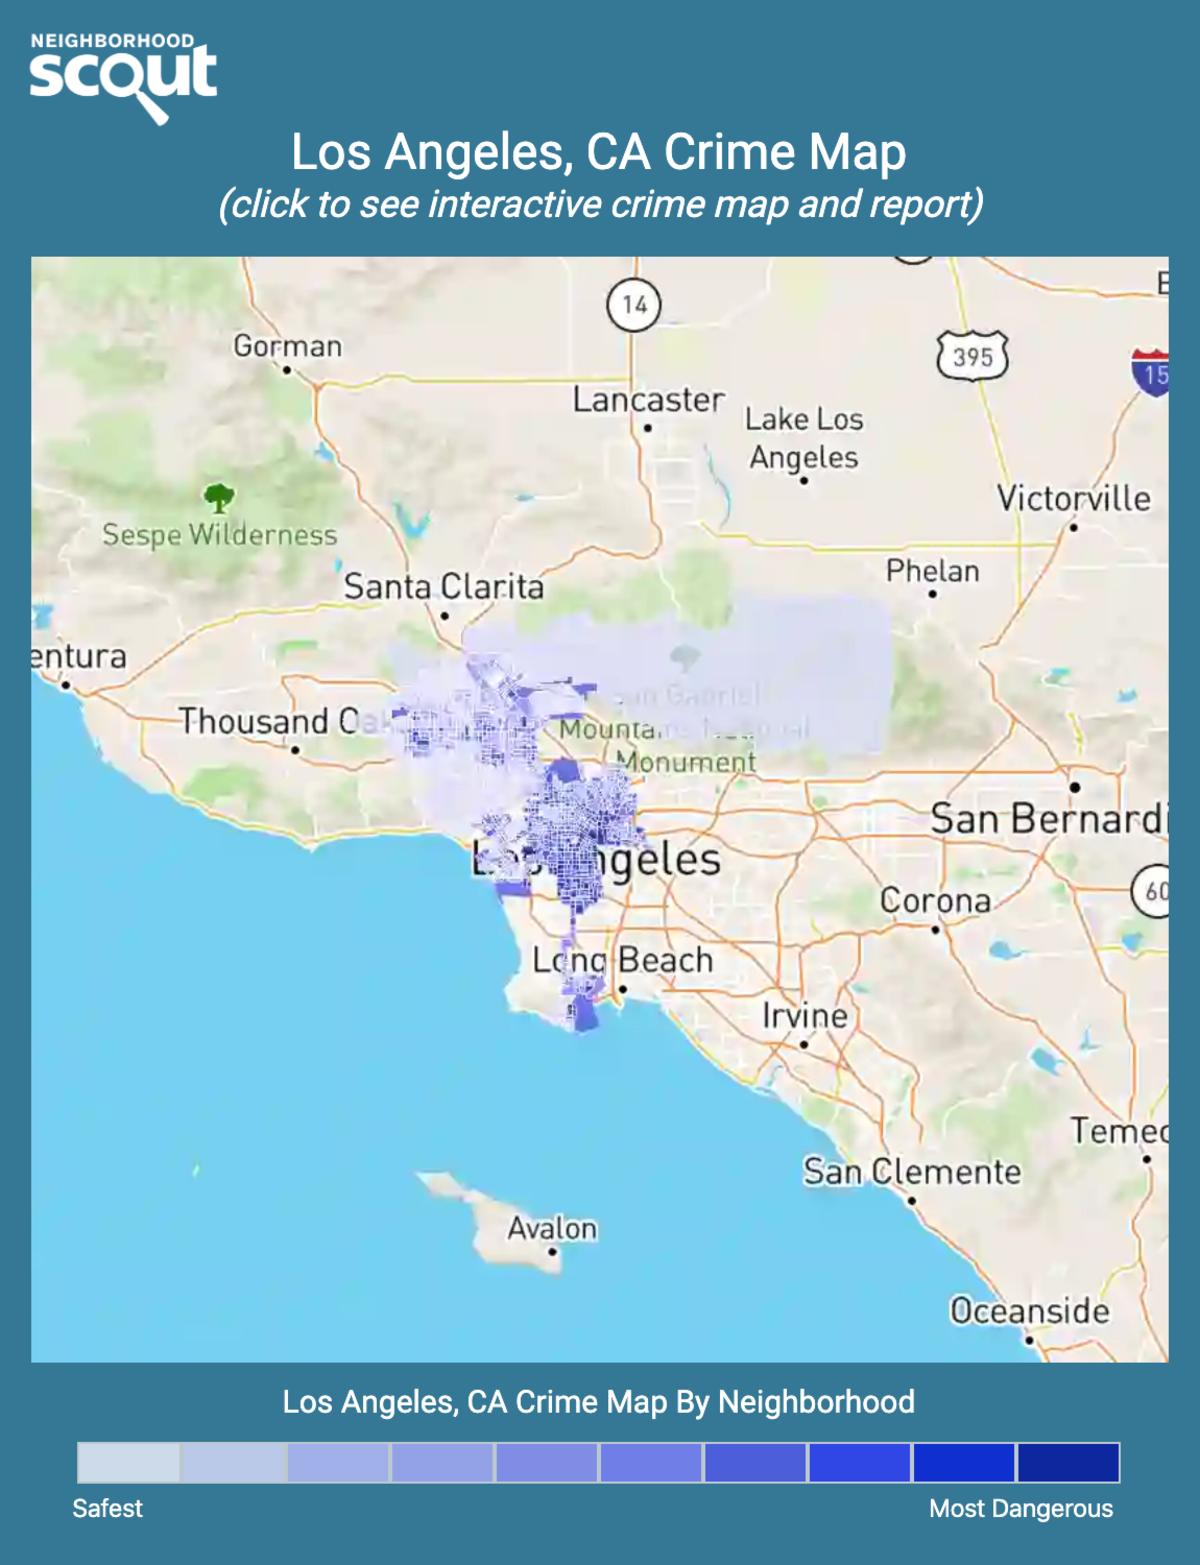 Los Angeles, California crime map